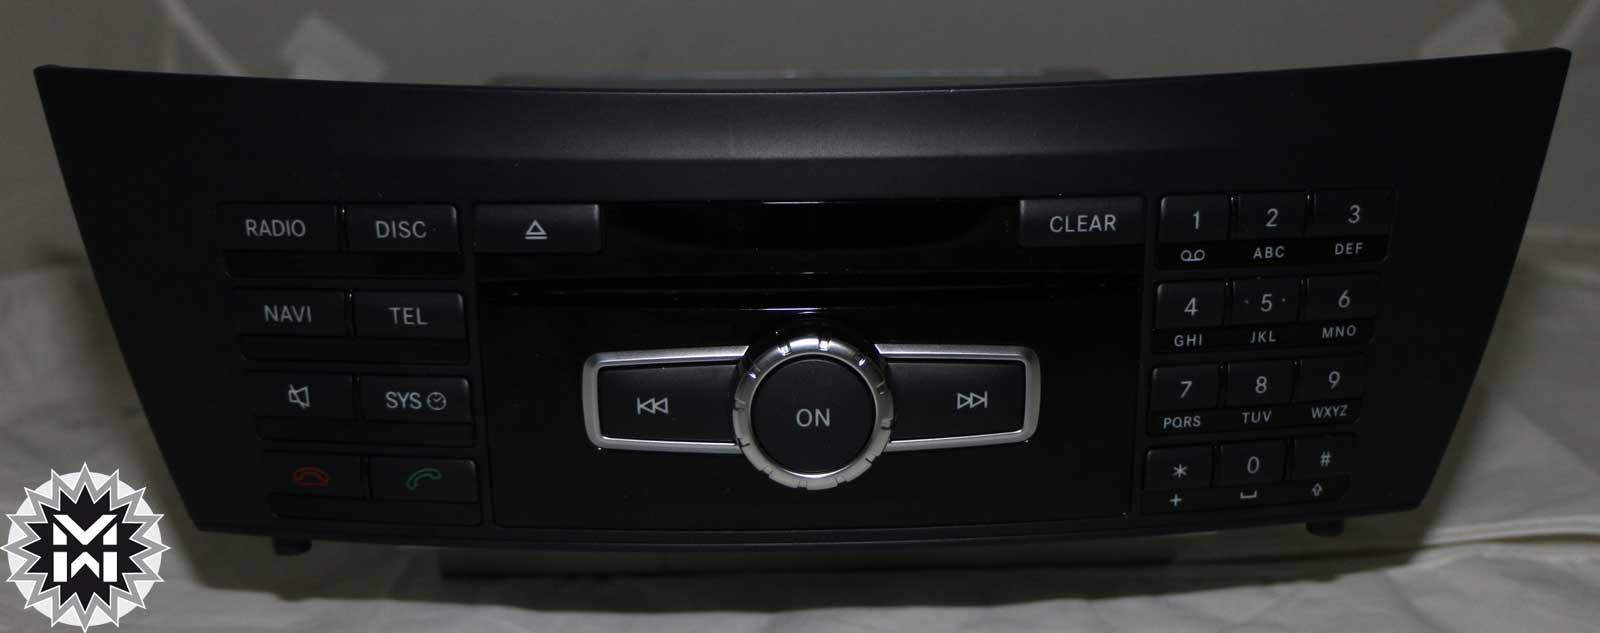 mercedes autoradio radio audio 20 cd c klasse w204. Black Bedroom Furniture Sets. Home Design Ideas